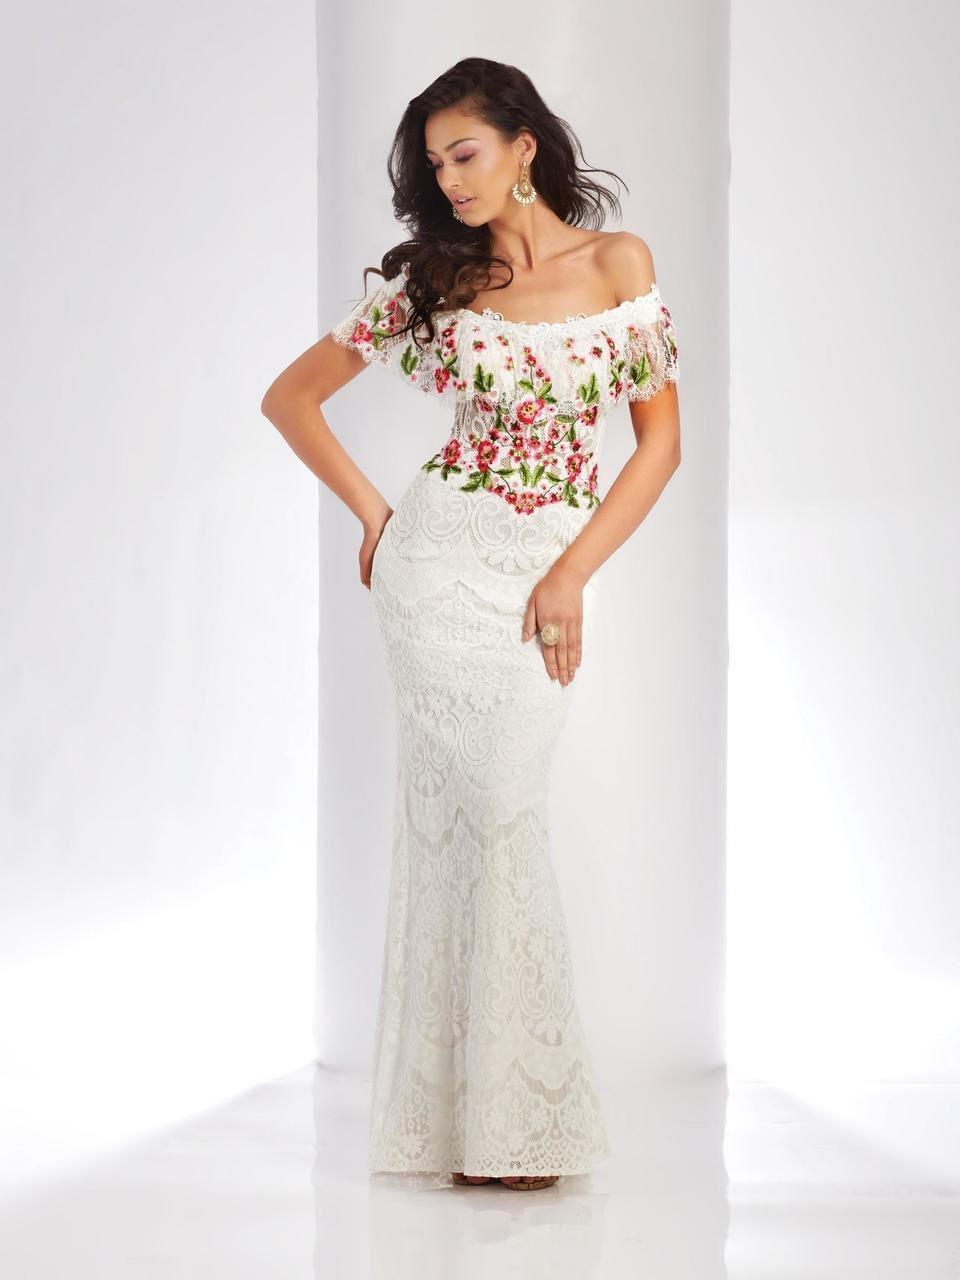 Clarisse - 4954 Embroidered Floral Off-Shoulder Gown